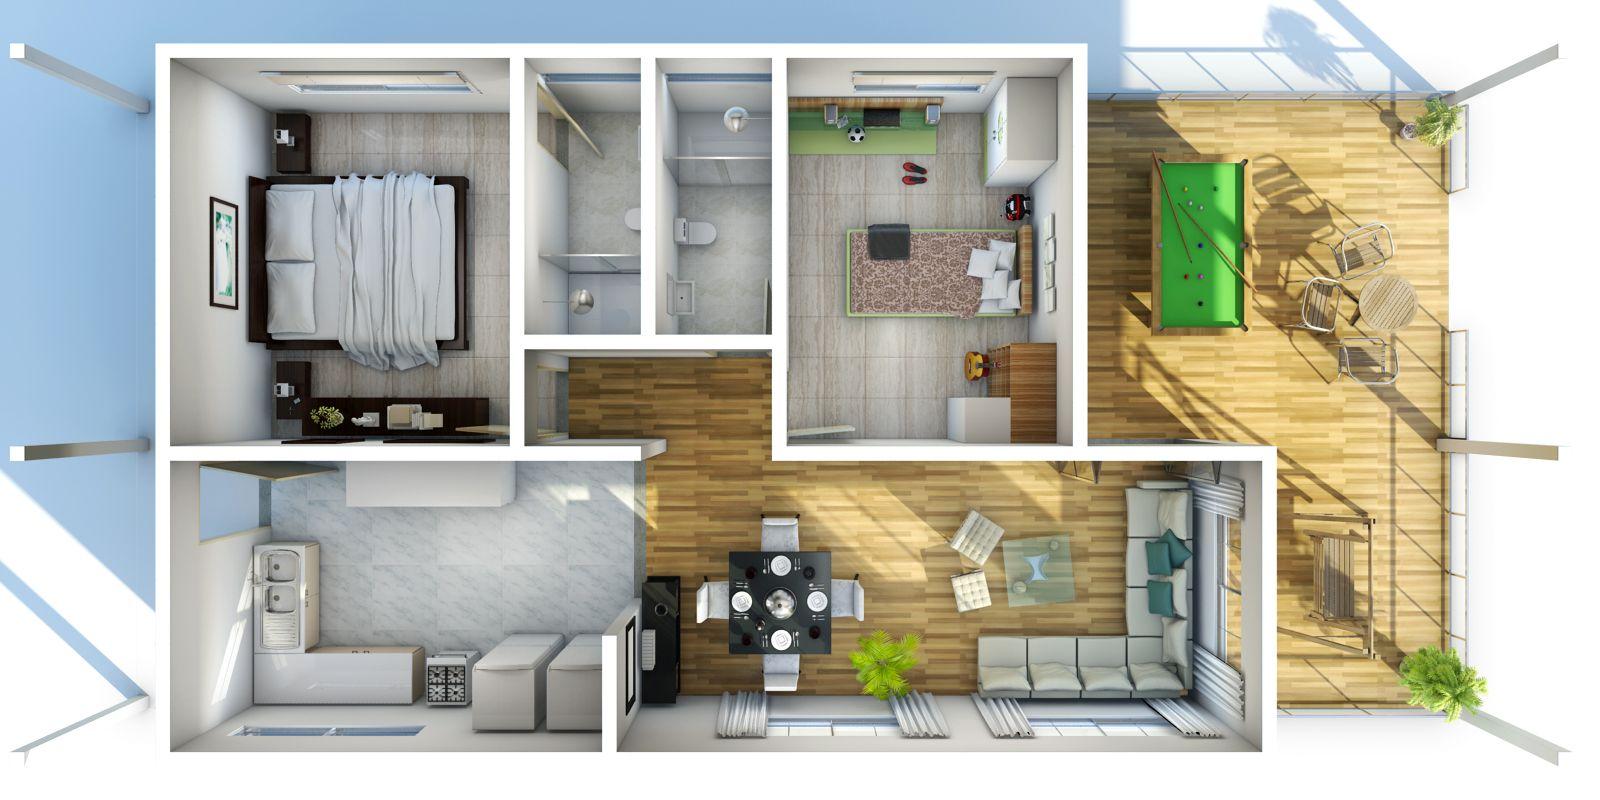 perspectiva de planta humanizada trabalhos pinterest graphics perspectiva de planta humanizada floor planssimple